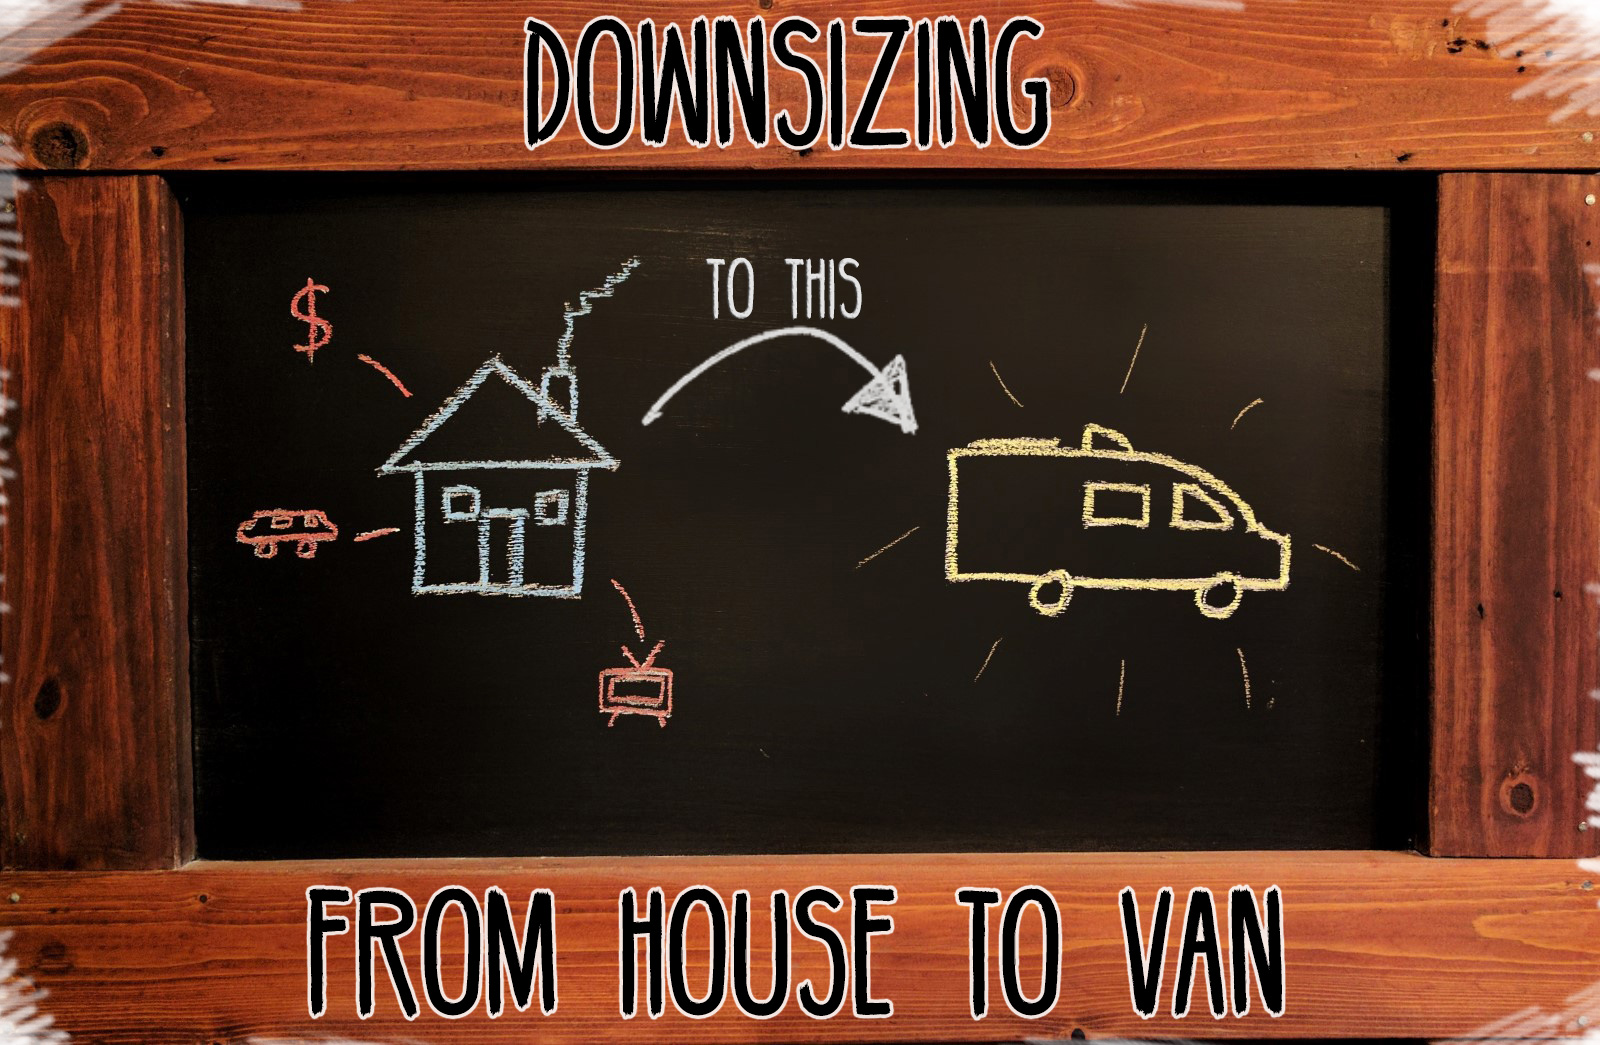 Ford Transit Camper Van Sprinter Upfitters Wiring Diagrams The Downsizing Heading Test